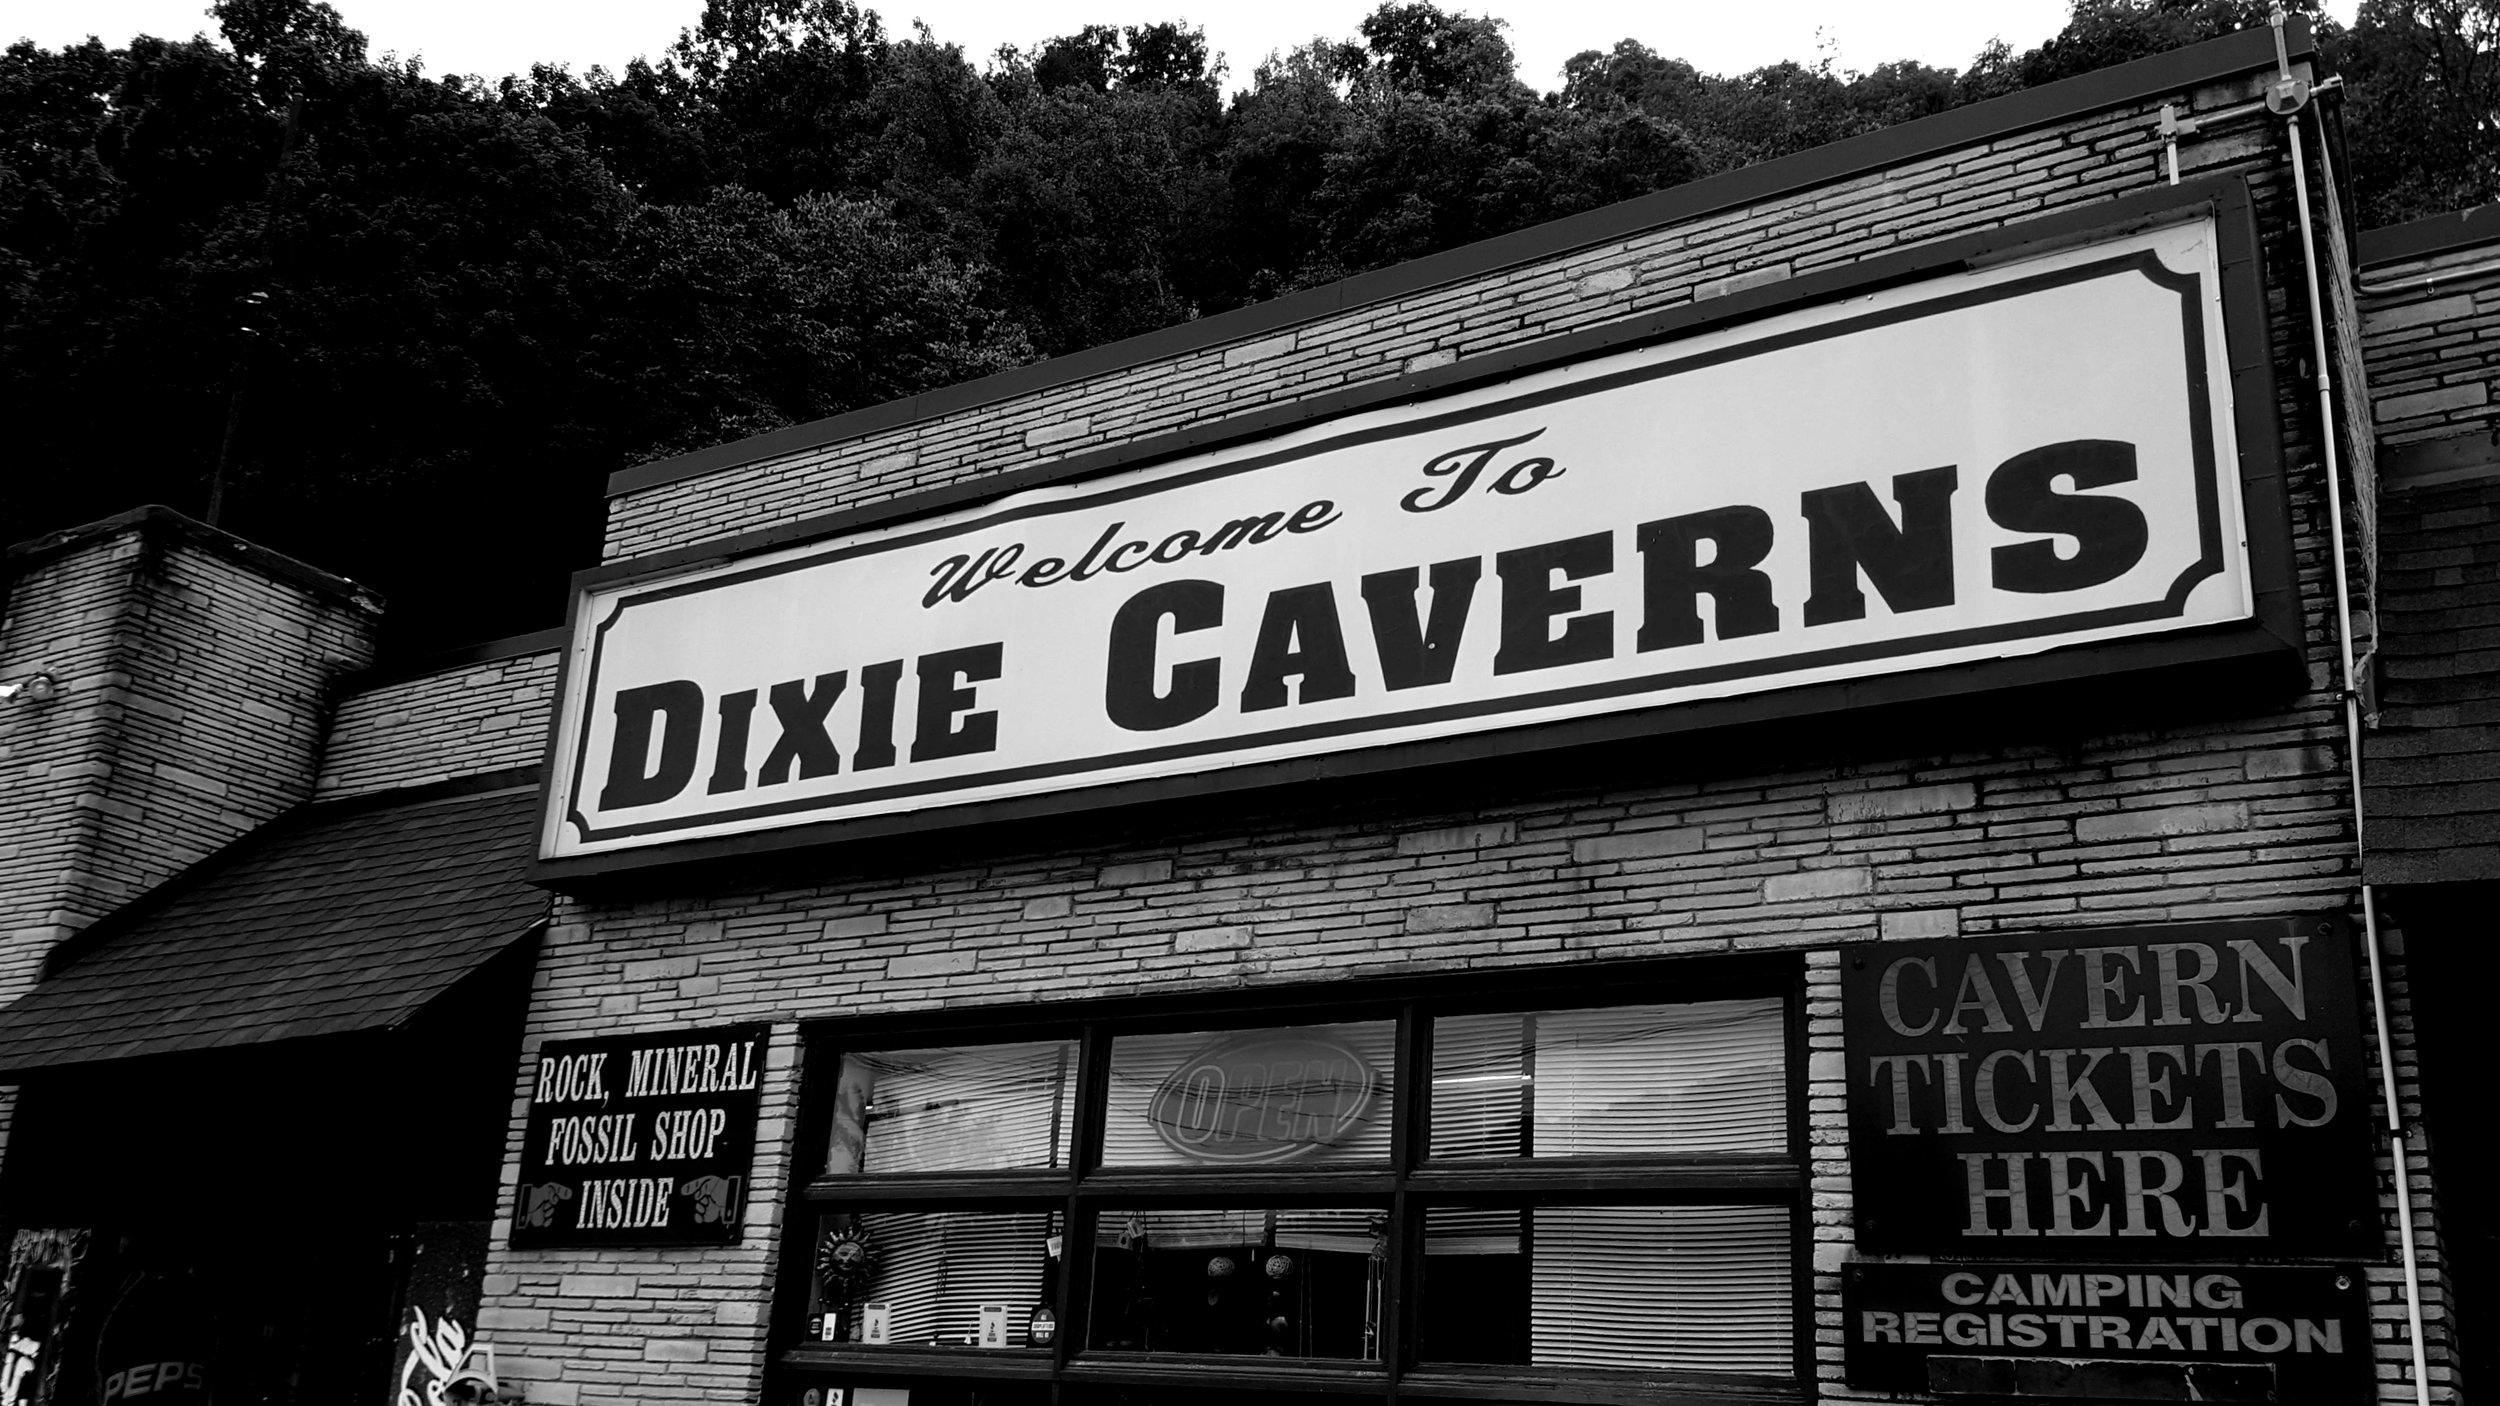 Dixie Caverns Store